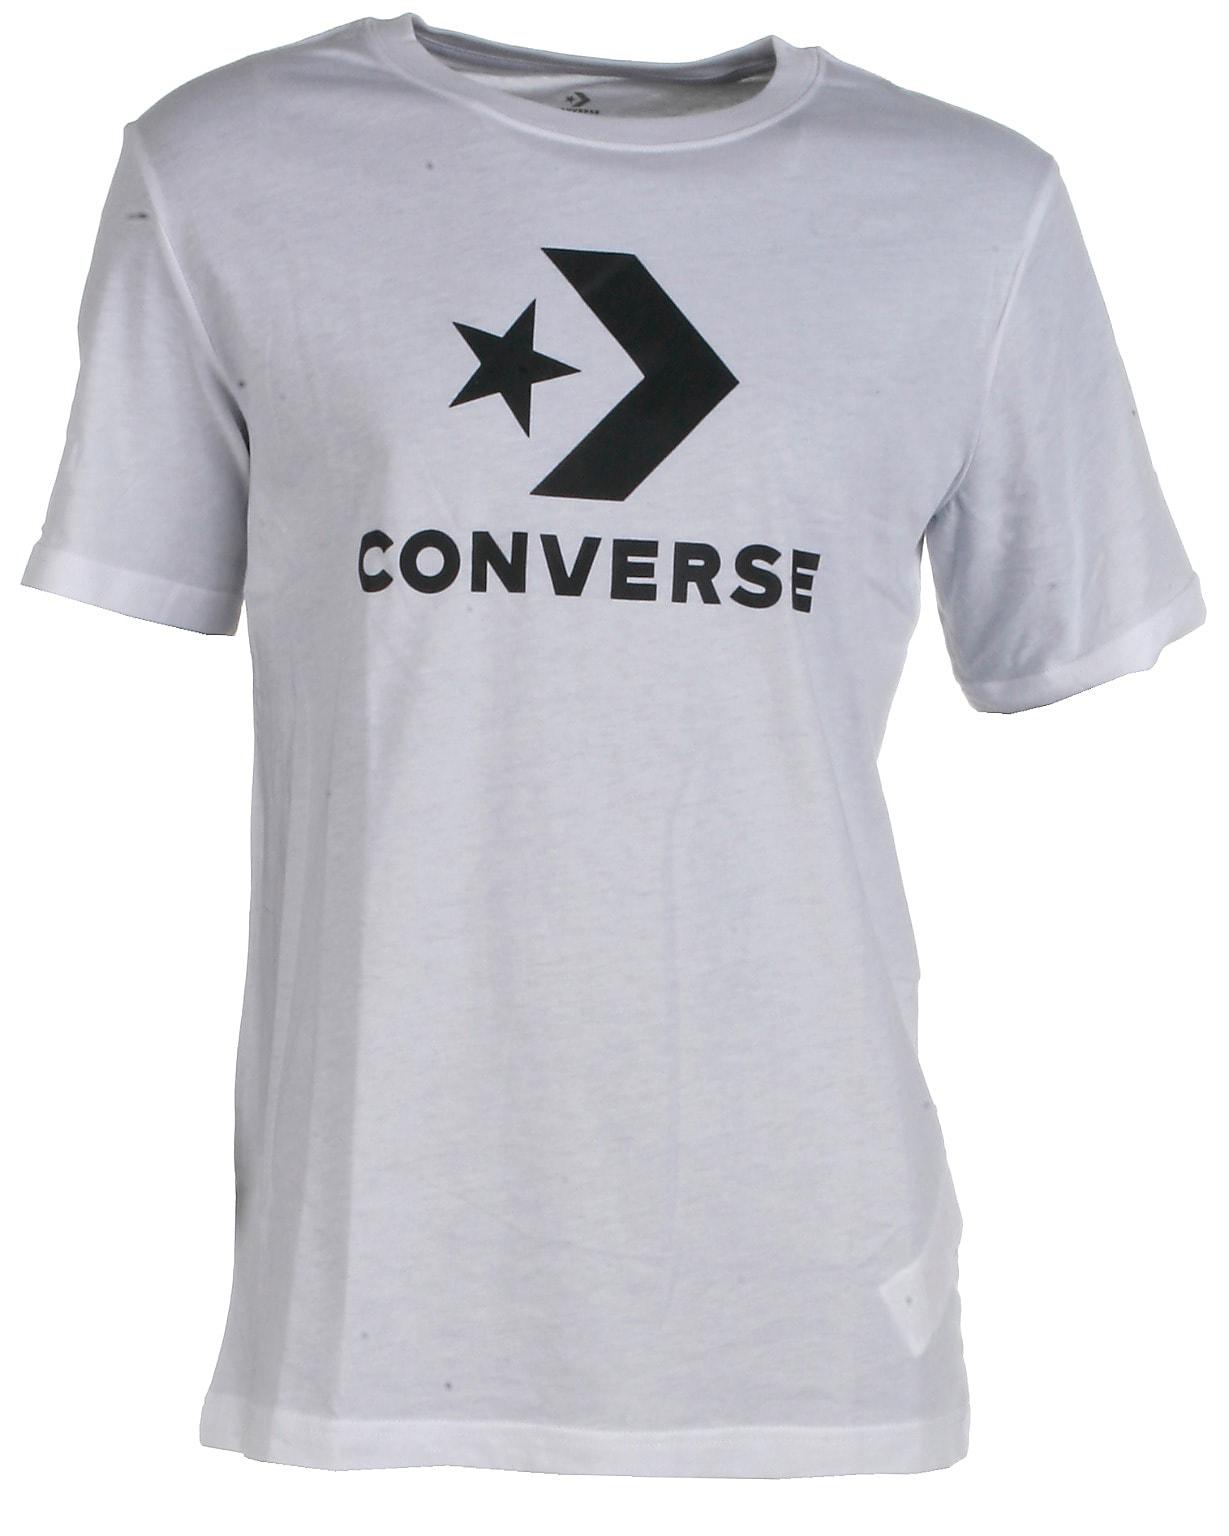 Converse t-shirt s/s, Wordmark, hvid